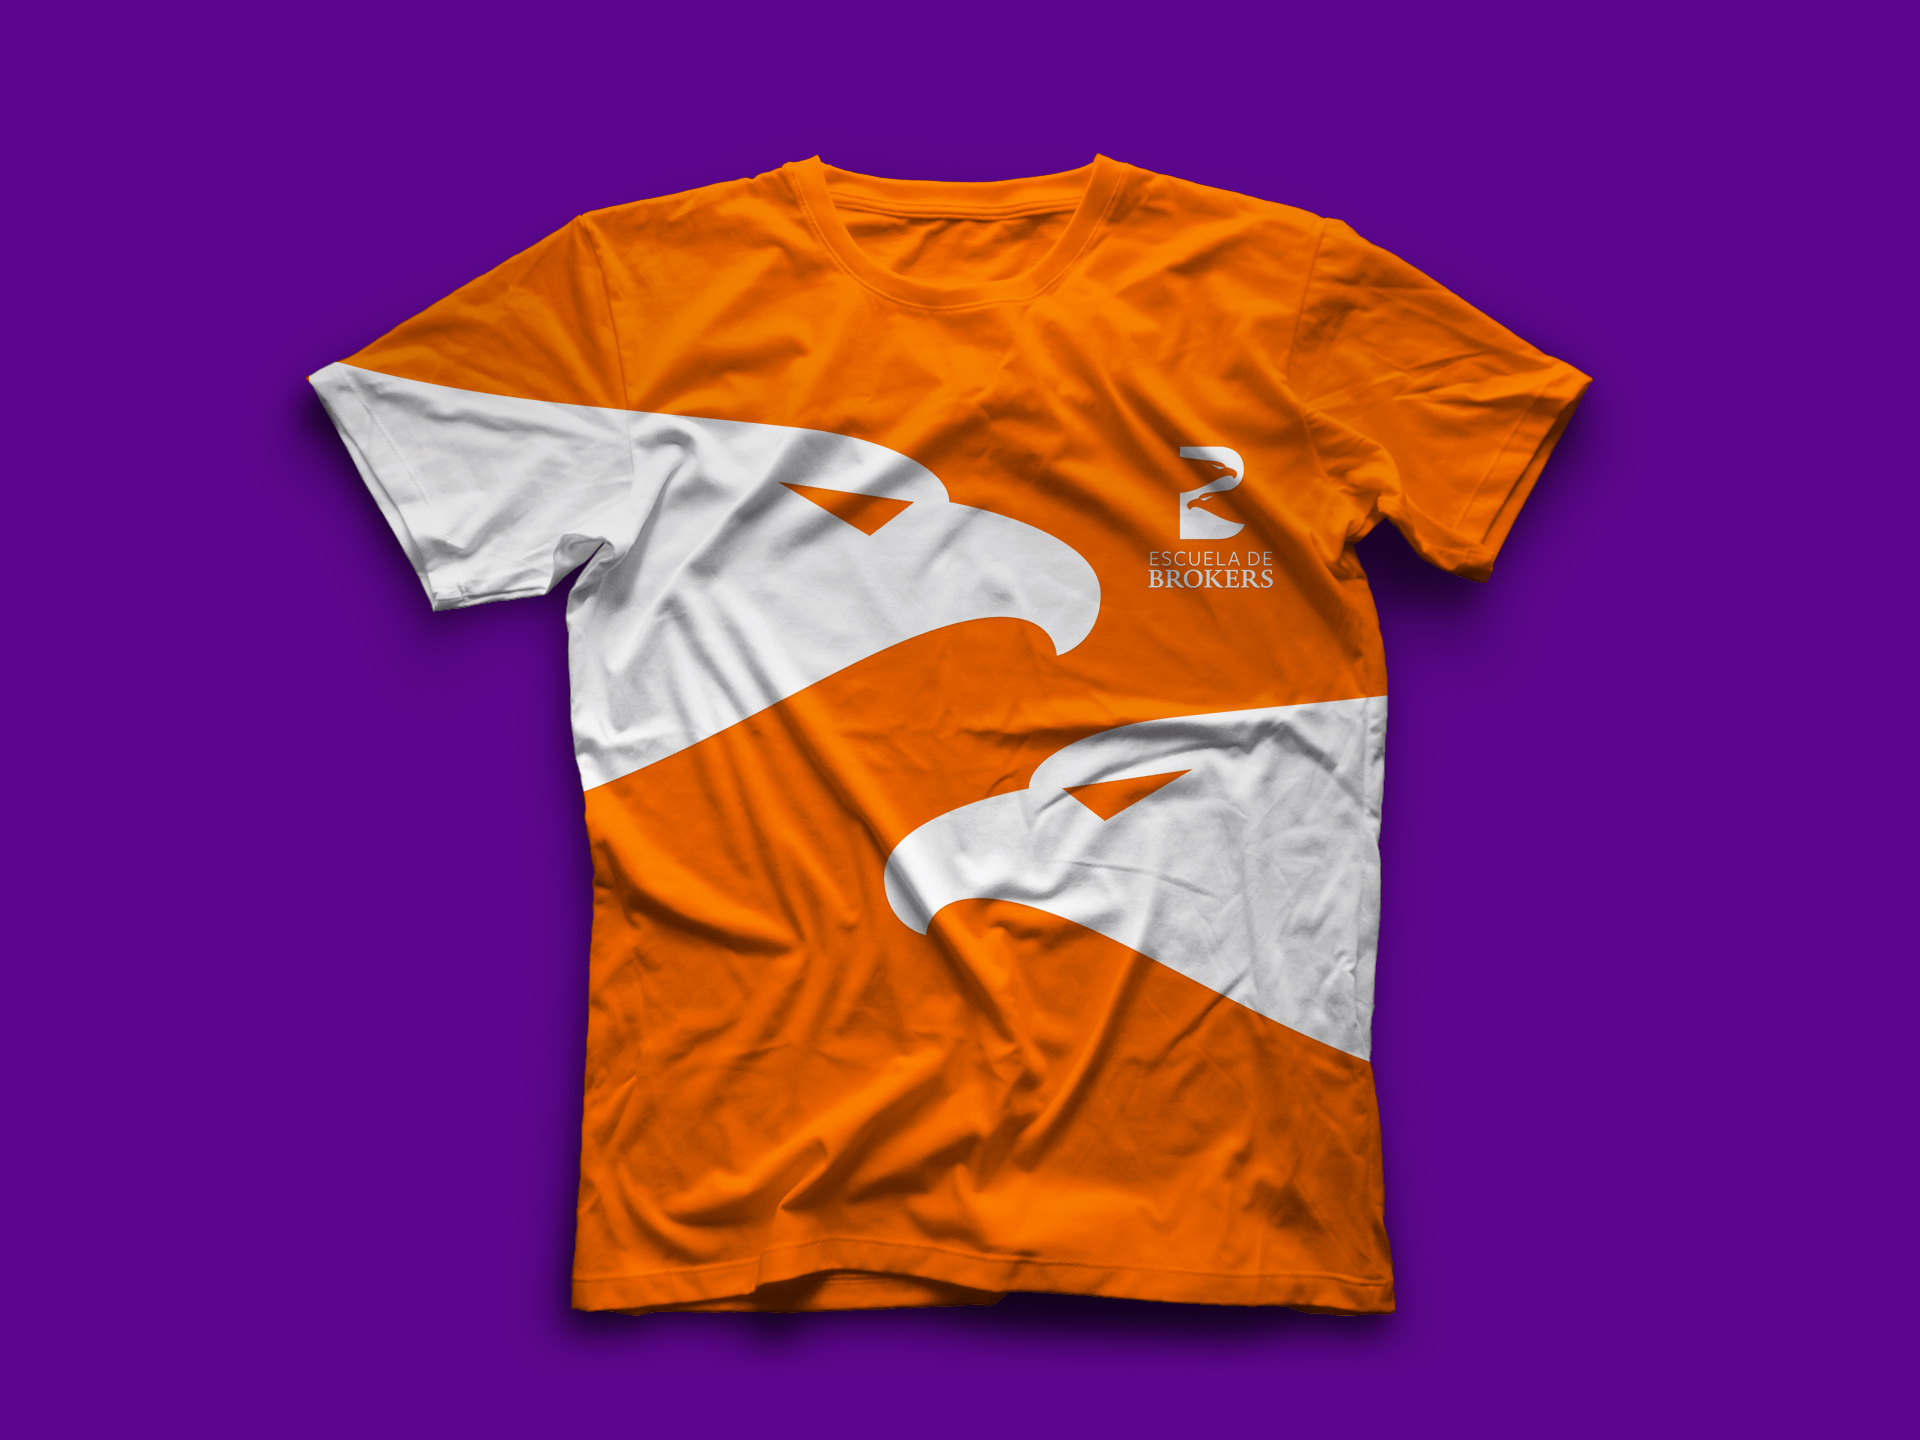 jhonatan-medina-caguana_eb_t_shirt